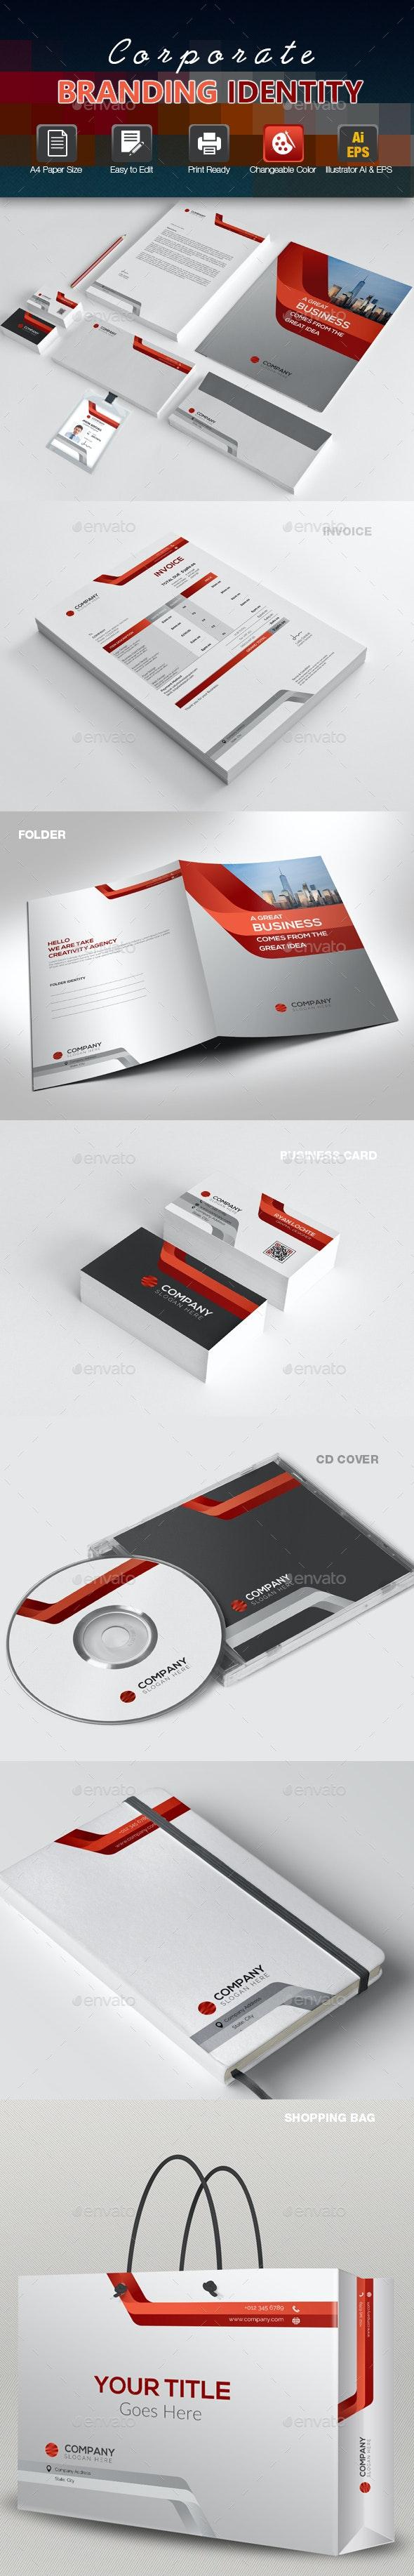 Corporate Branding Identity - Stationery Print Templates